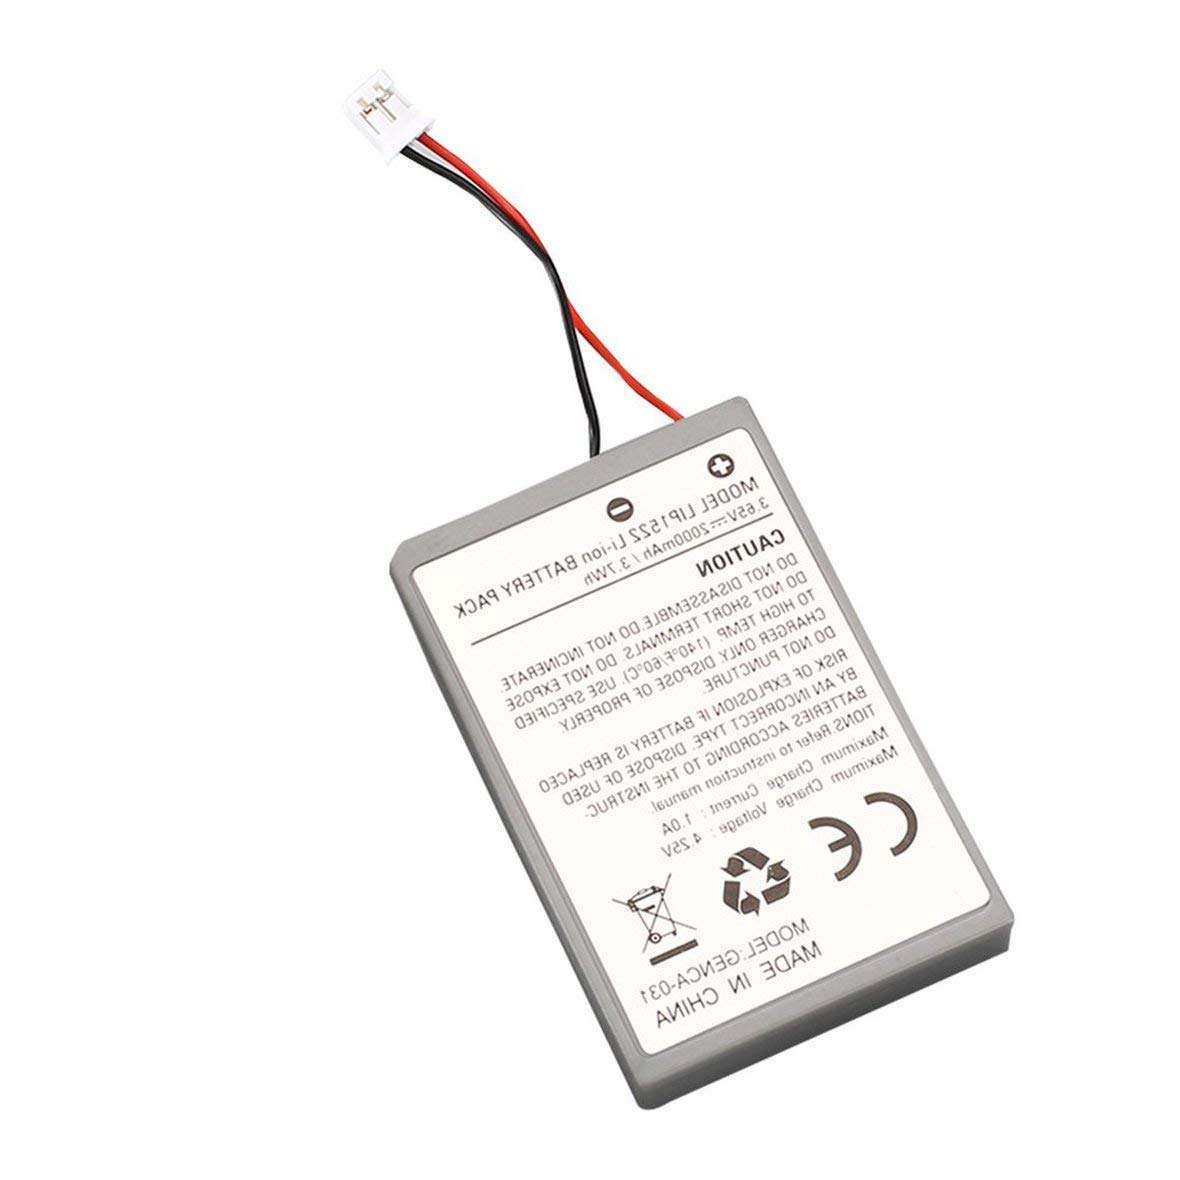 Heaviesk 1 ST/ÜCKE F/ÜR Sony Playstation PS4 Dual Shock 4 Controller Ersatzbatterie